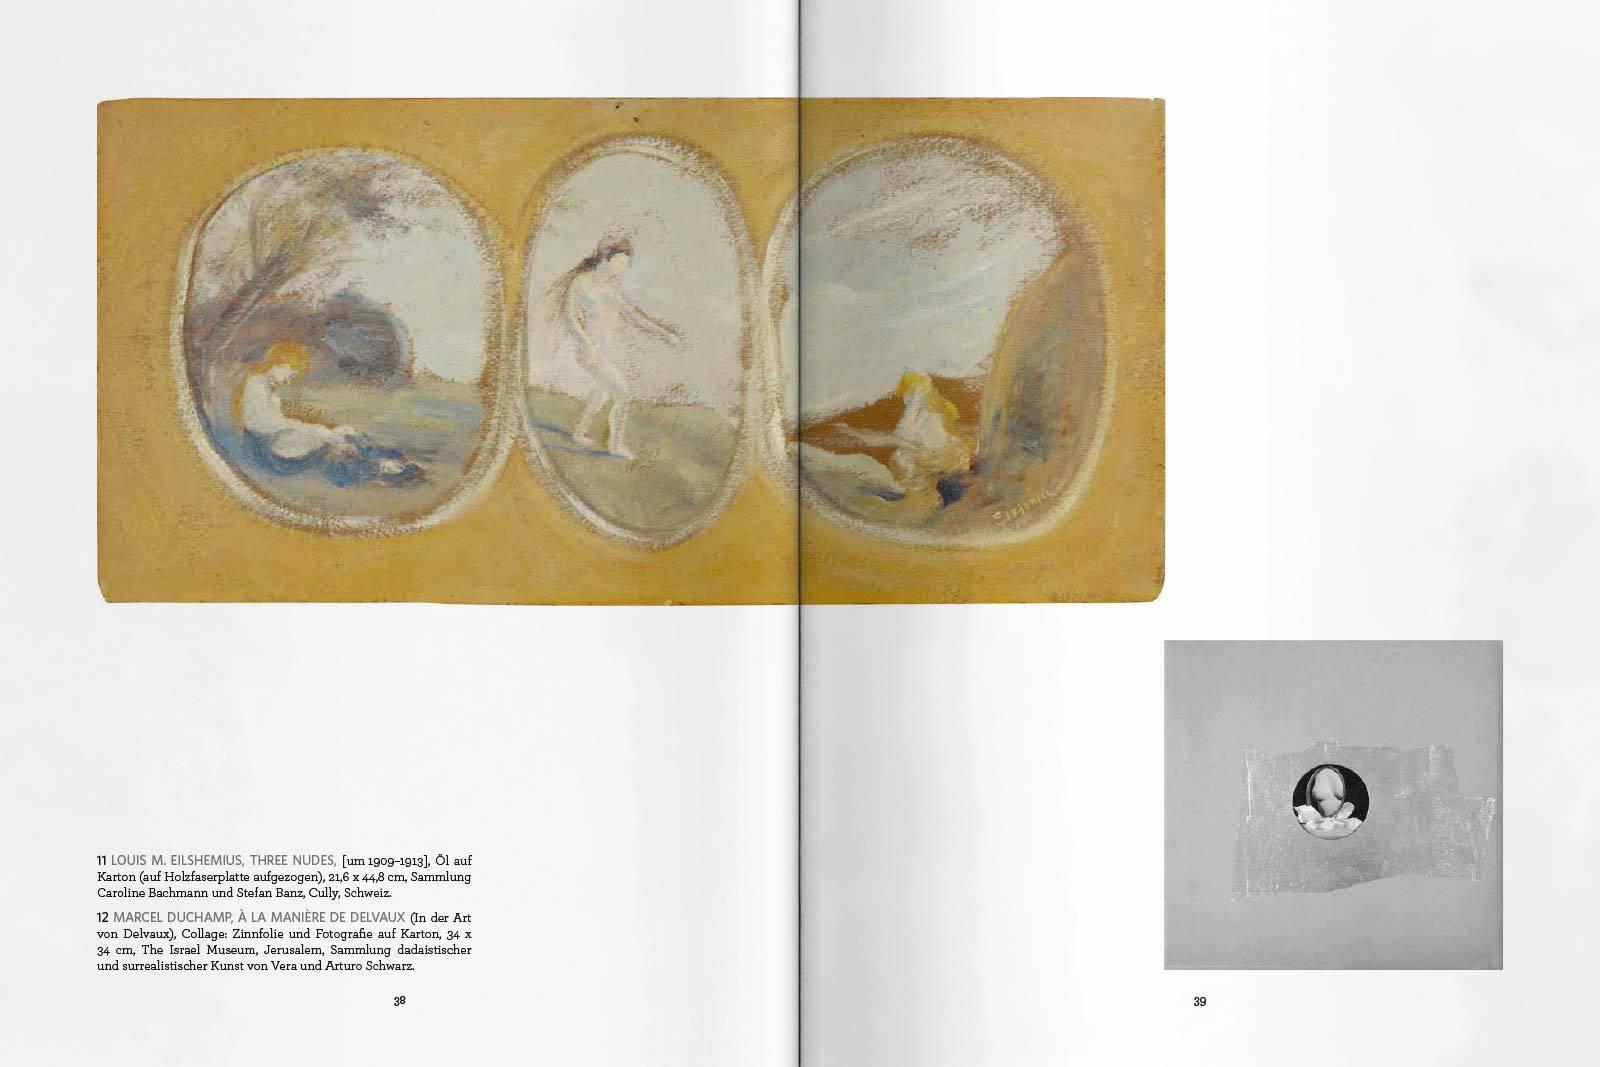 Louis Michel Eilshemius spread05